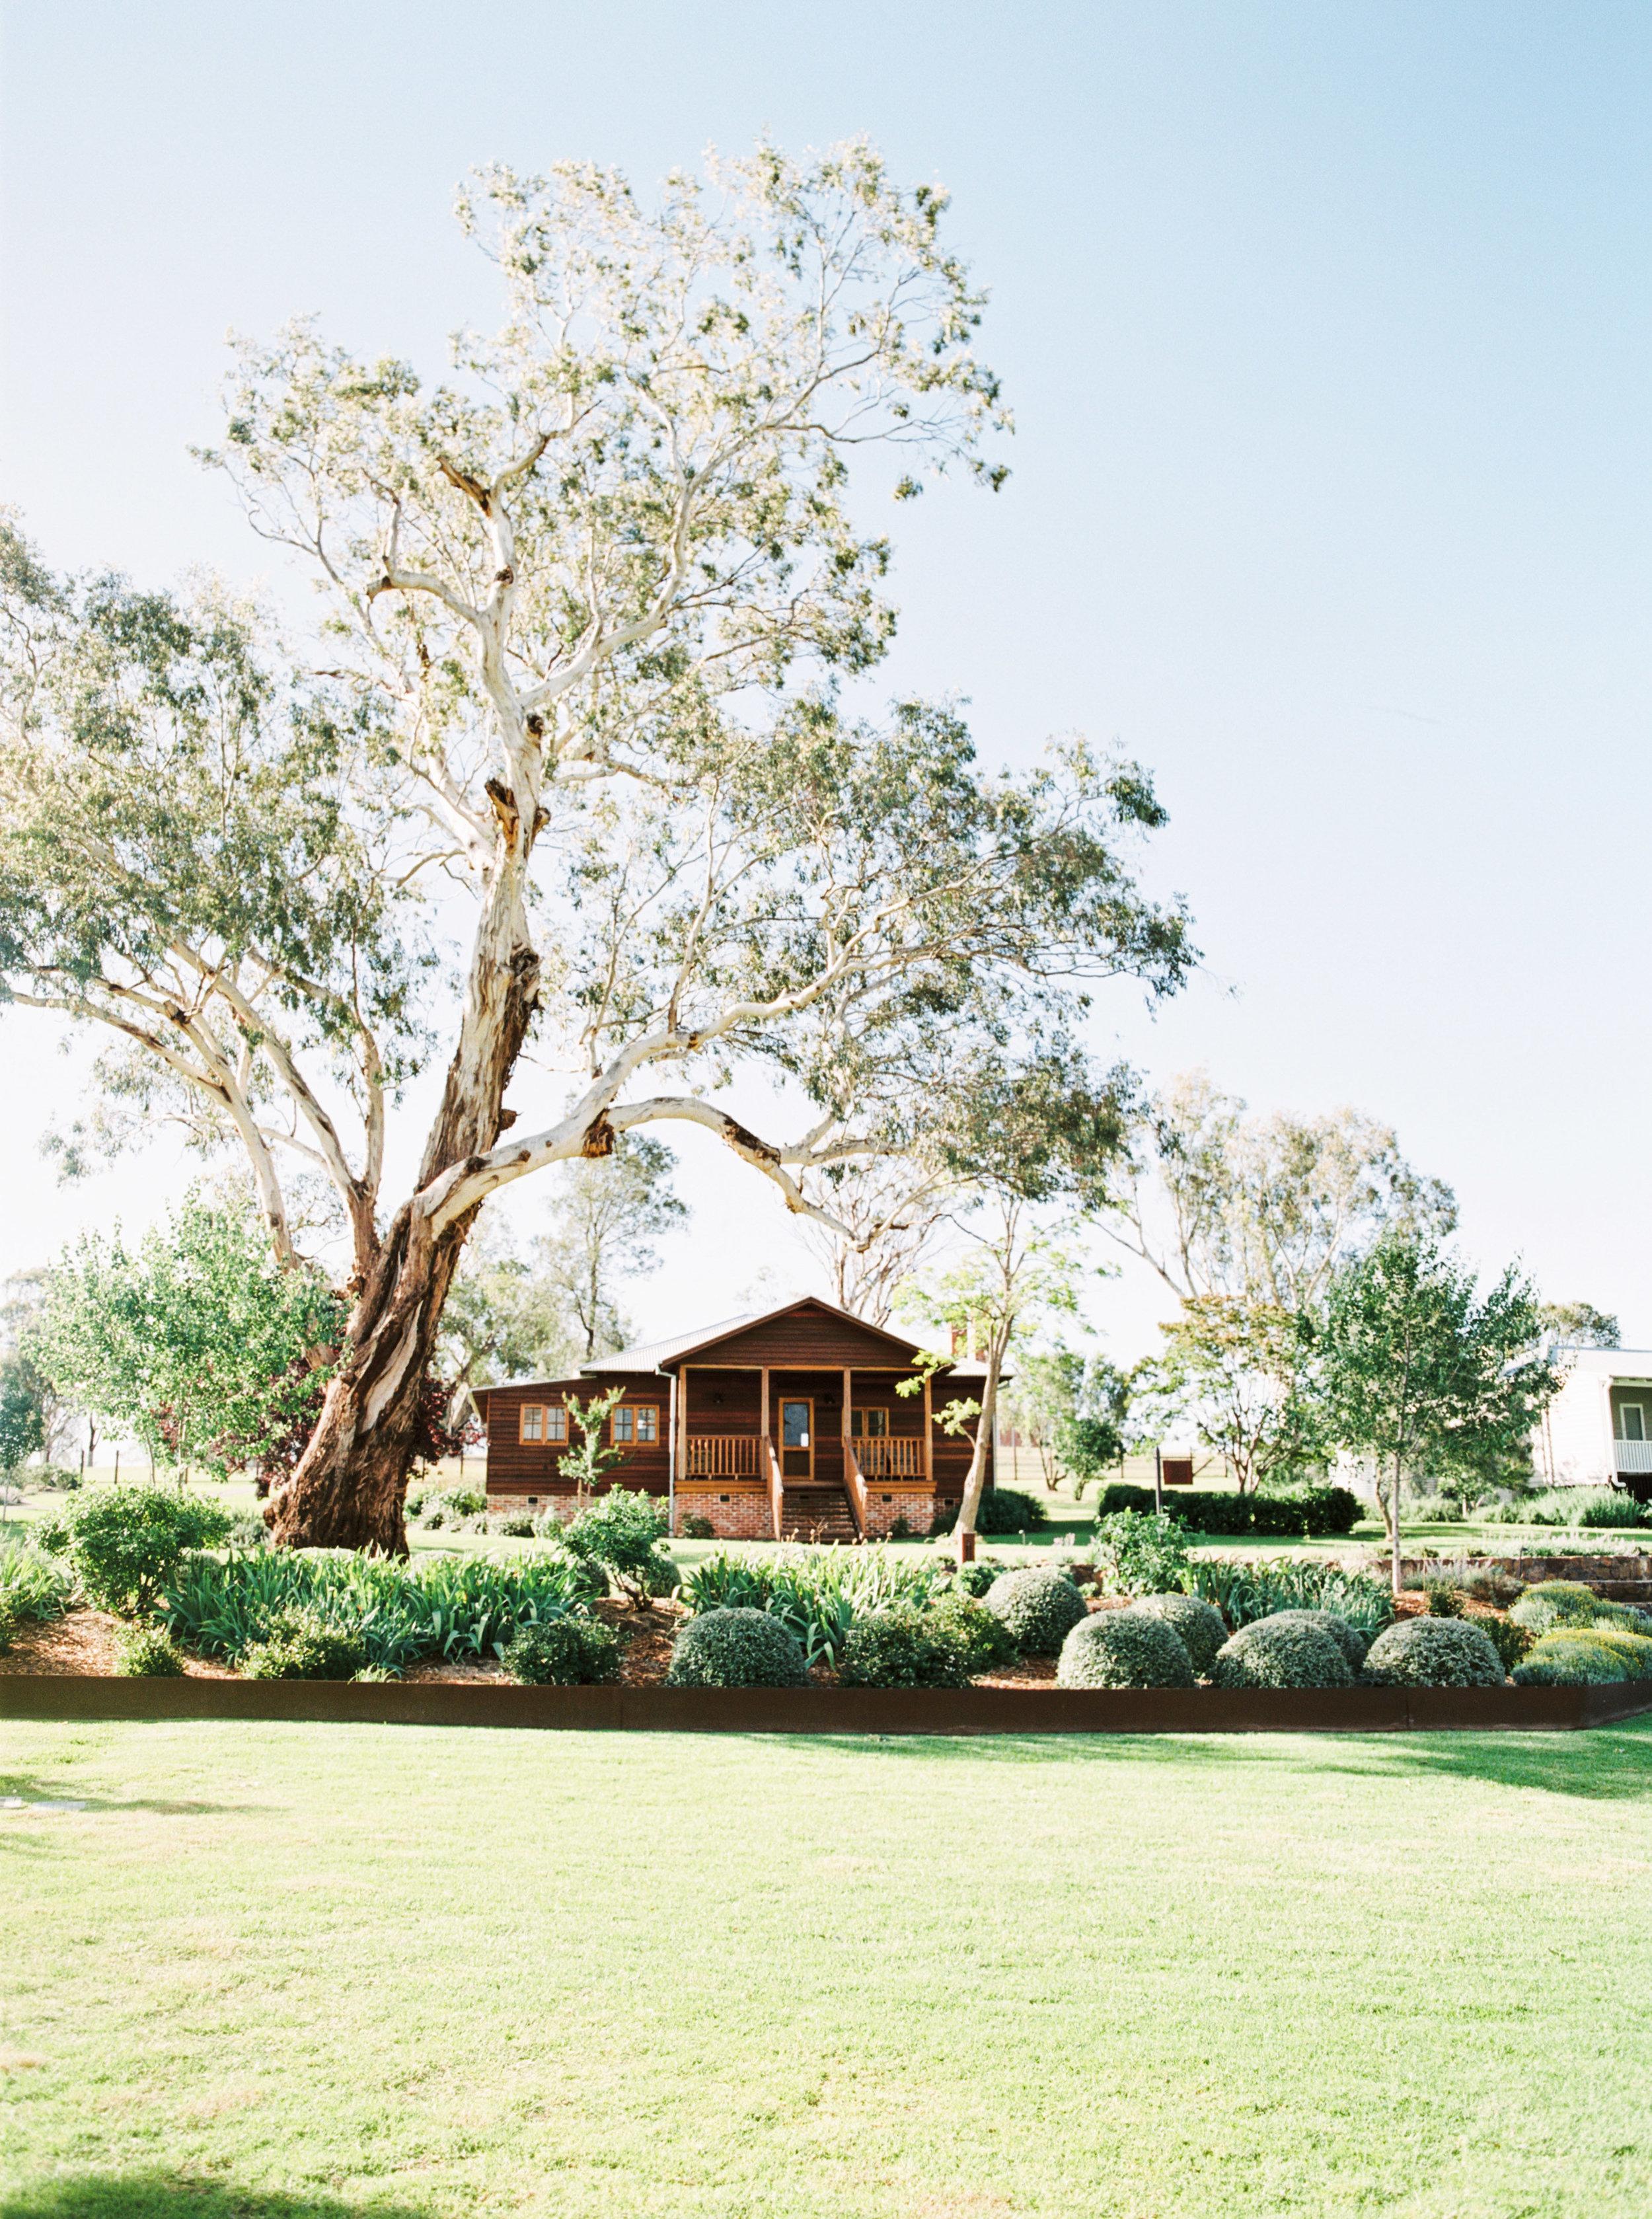 00029- Goonoo Goonoo Station Wedding Tamworth NSW Fine Art Film Wedding Photographer Sheri McMahon_-2.jpg